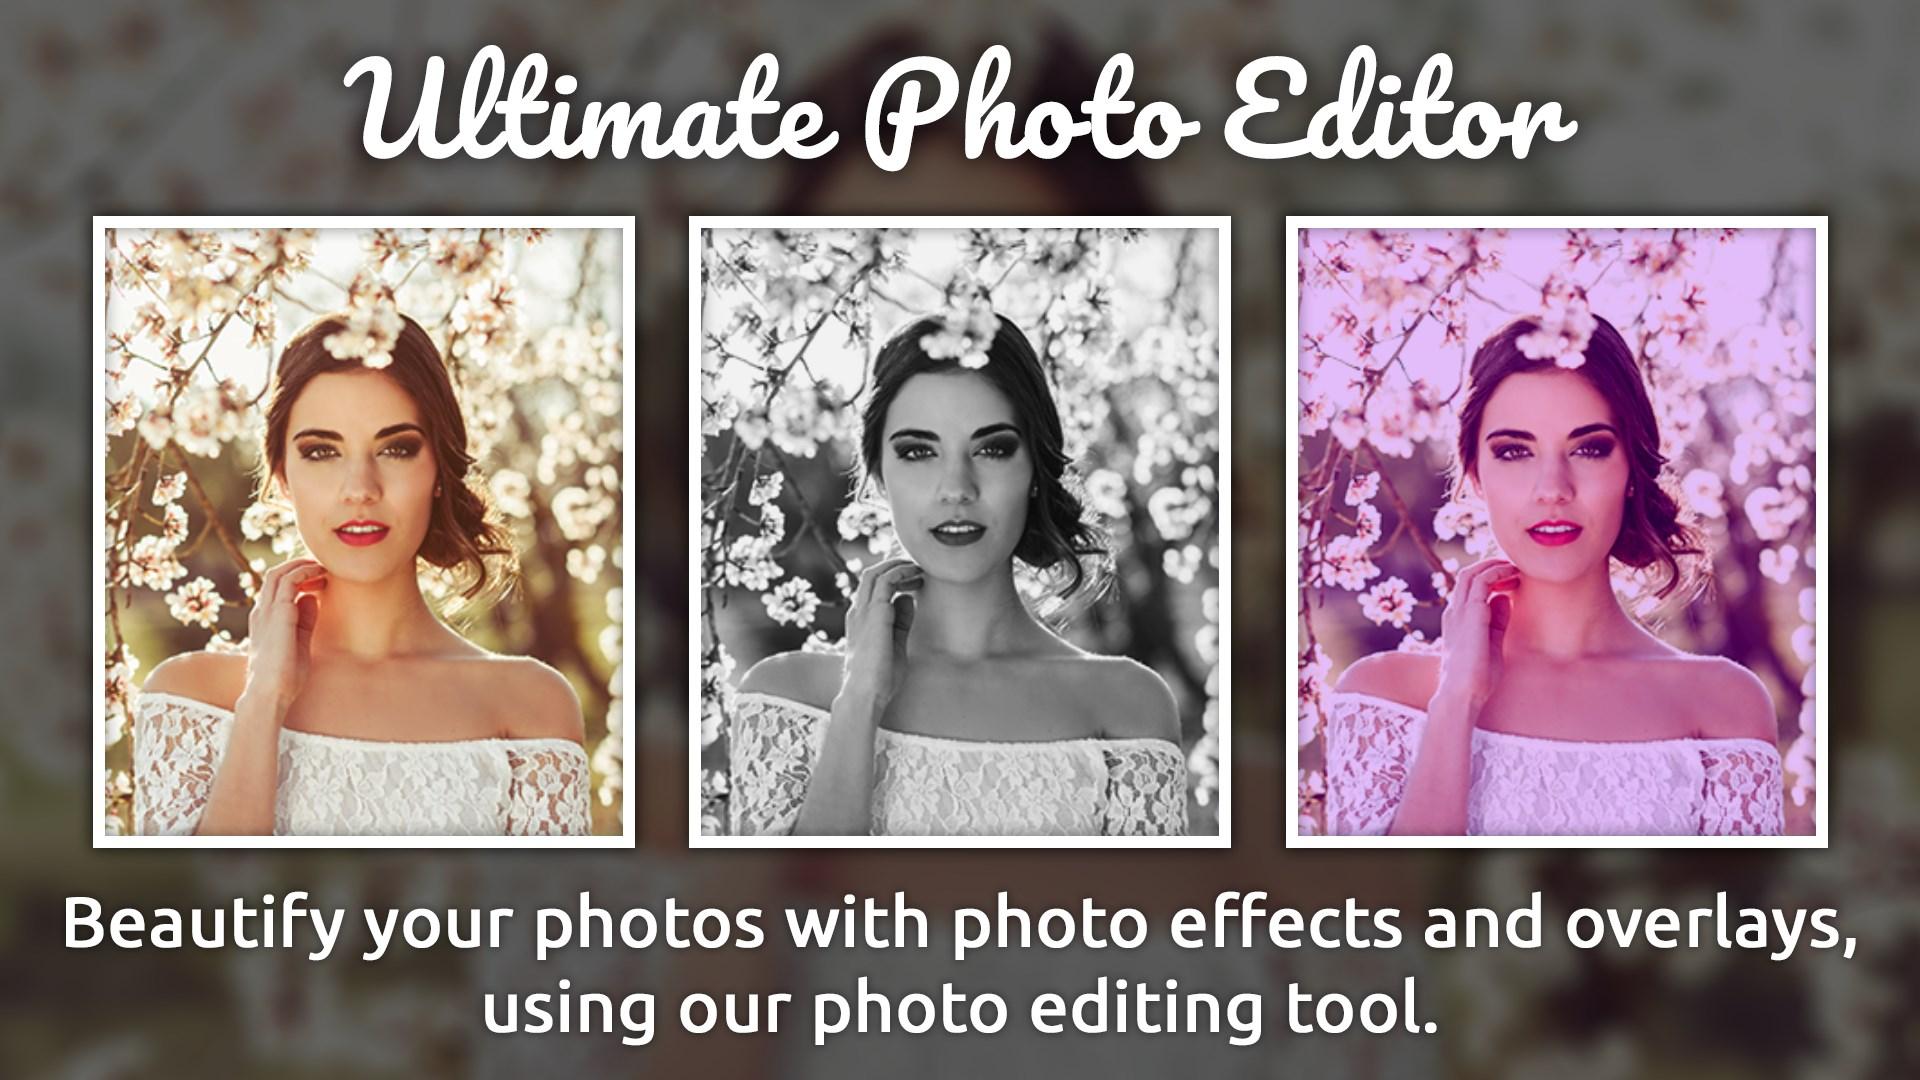 lr photo editing